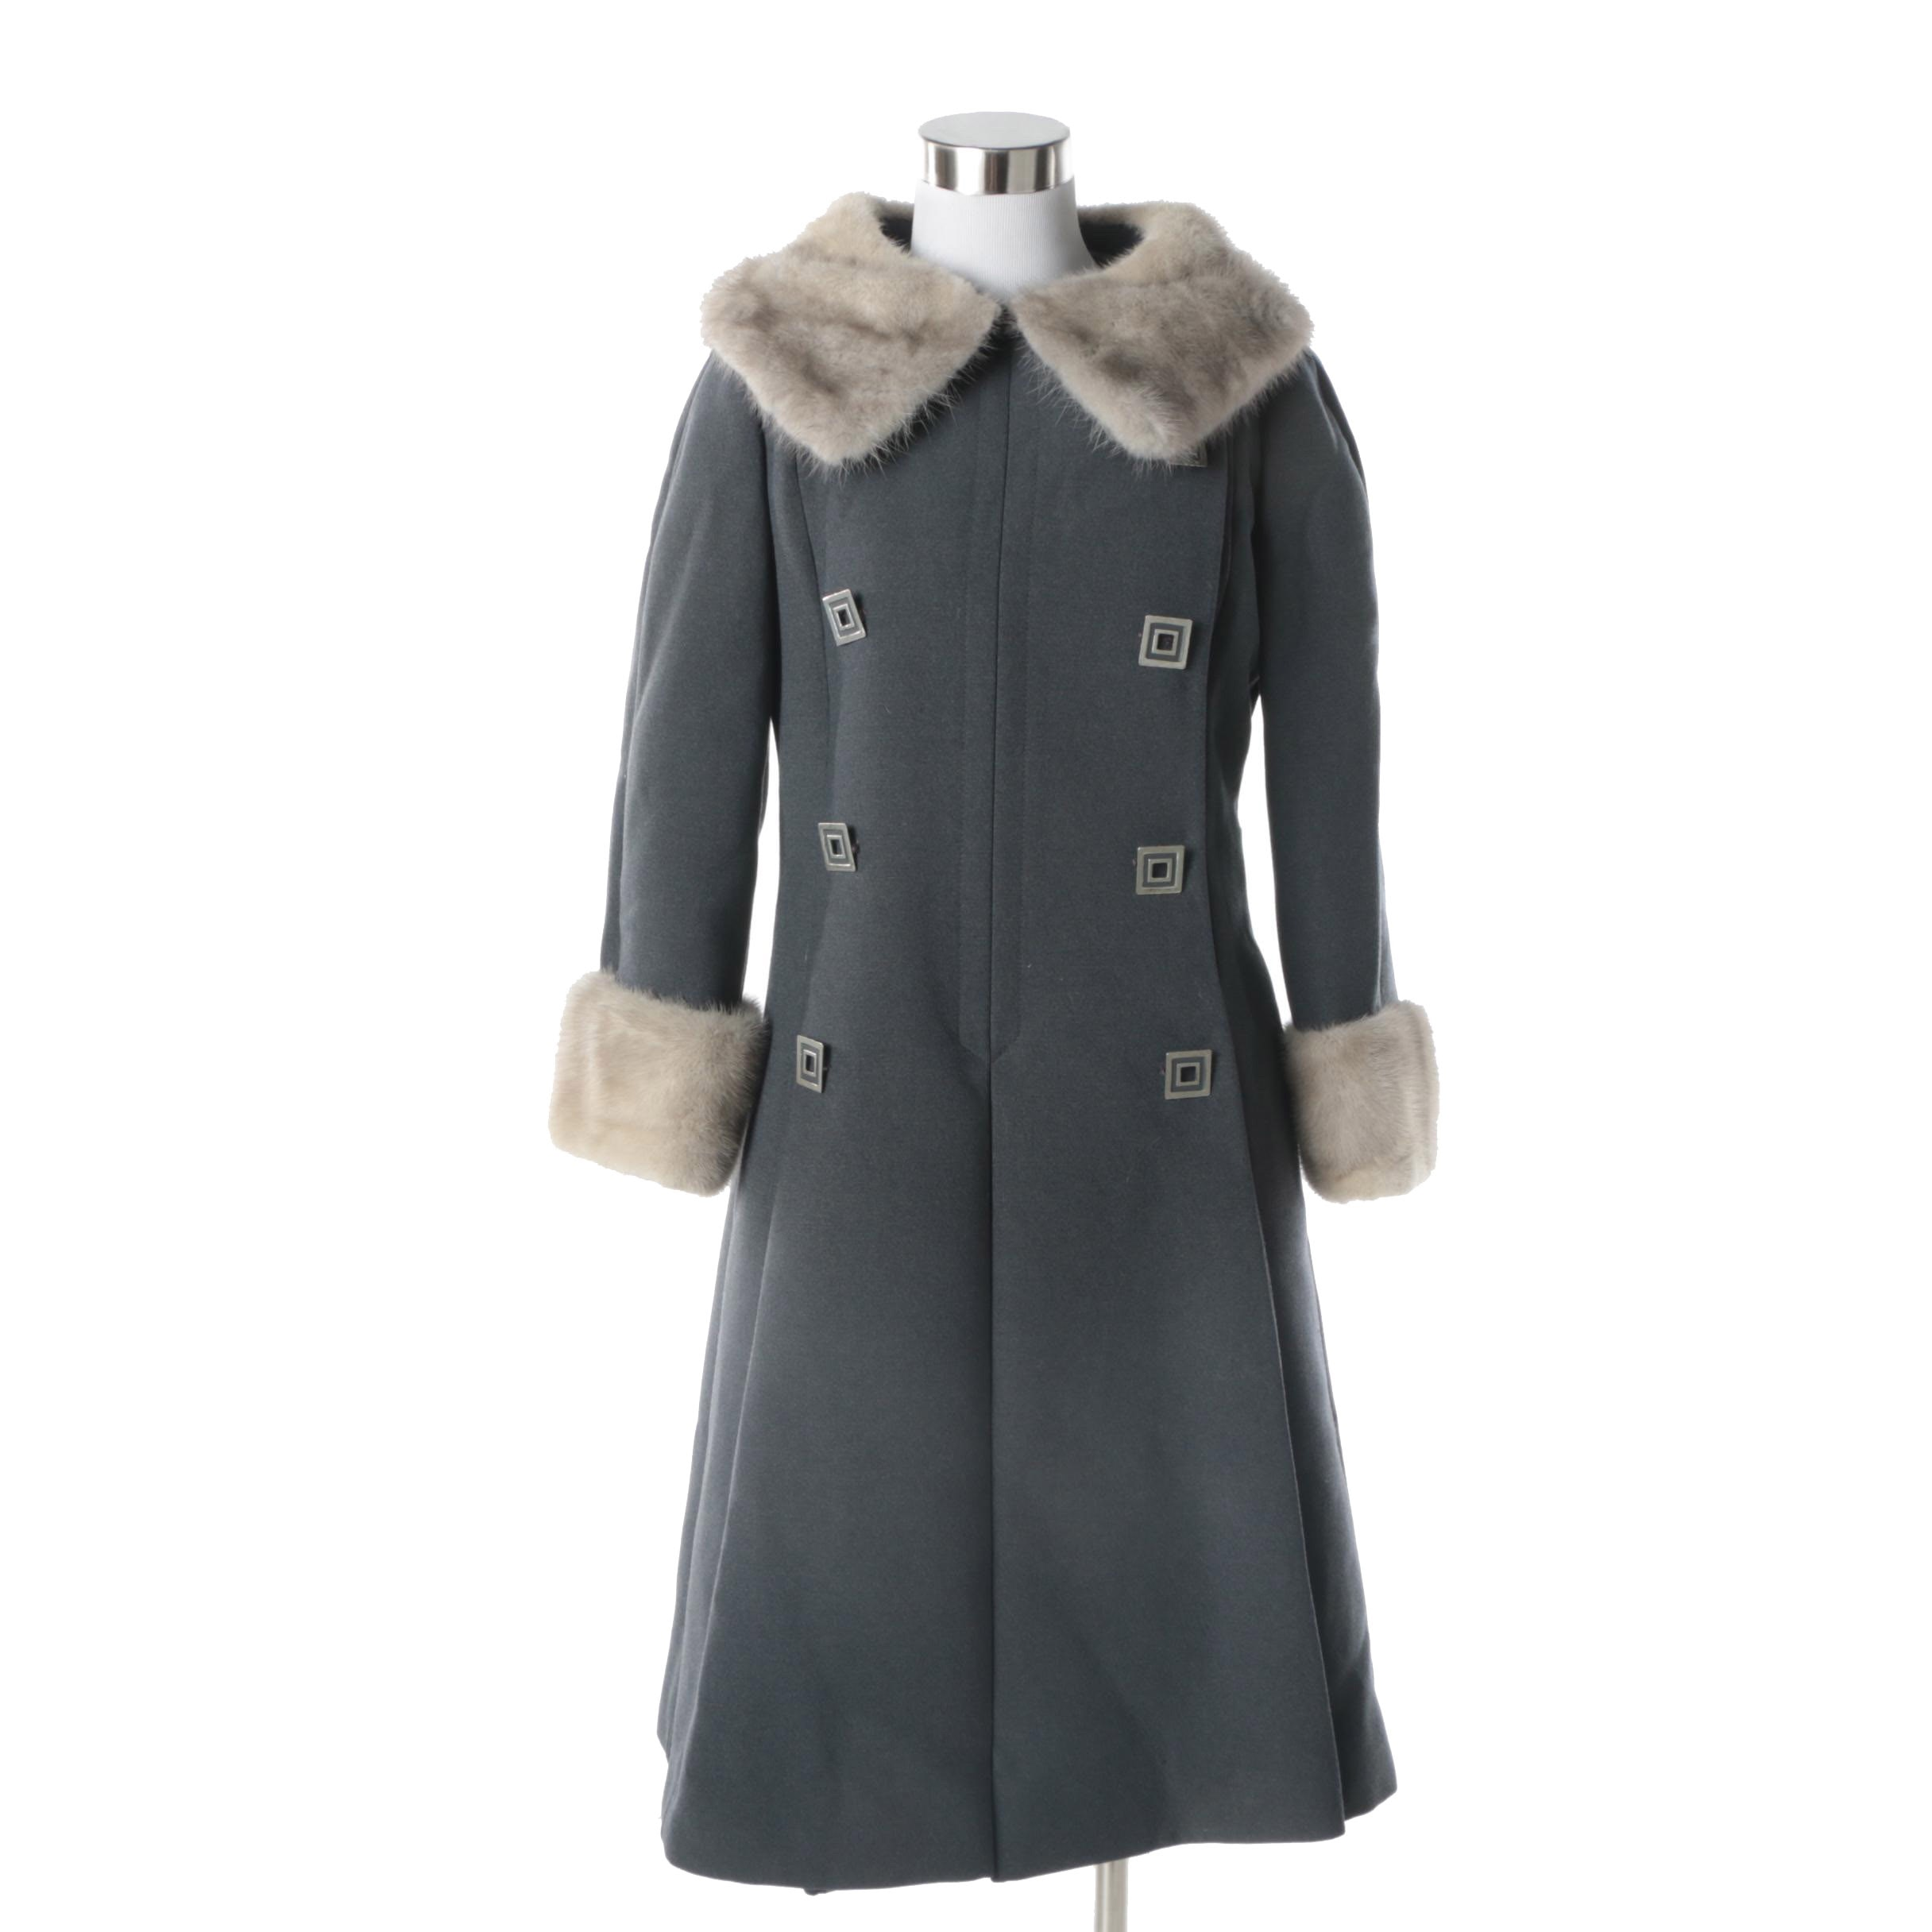 Women's Circa 1960s Vintage Grey Wool Princess Coat with Mink Fur Trim